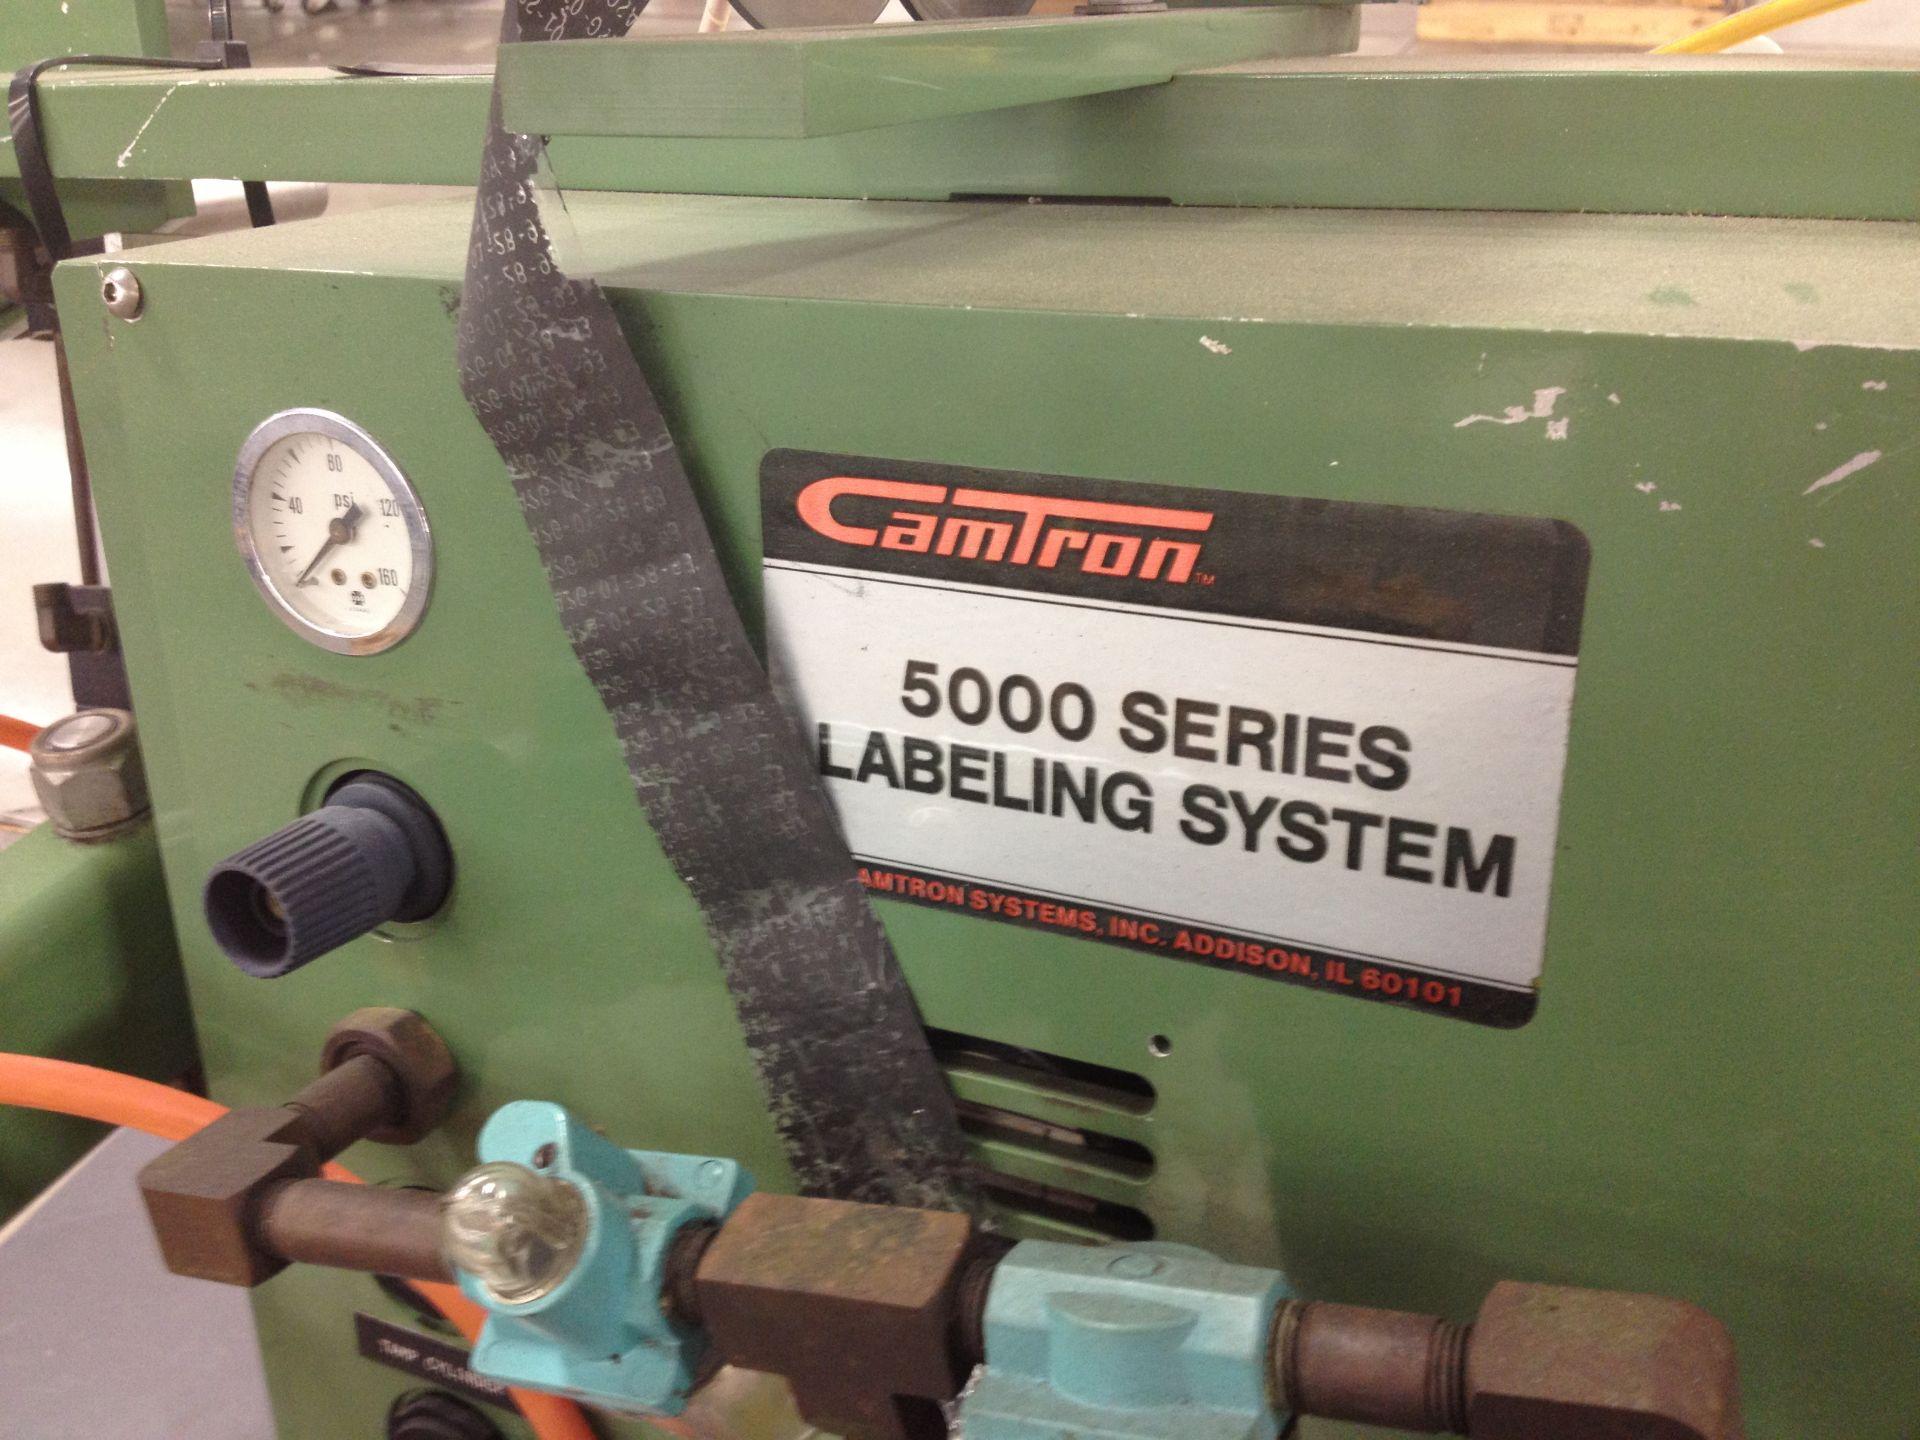 Camtron Portable Pressure Sensitive Carton Labeler - Image 4 of 5